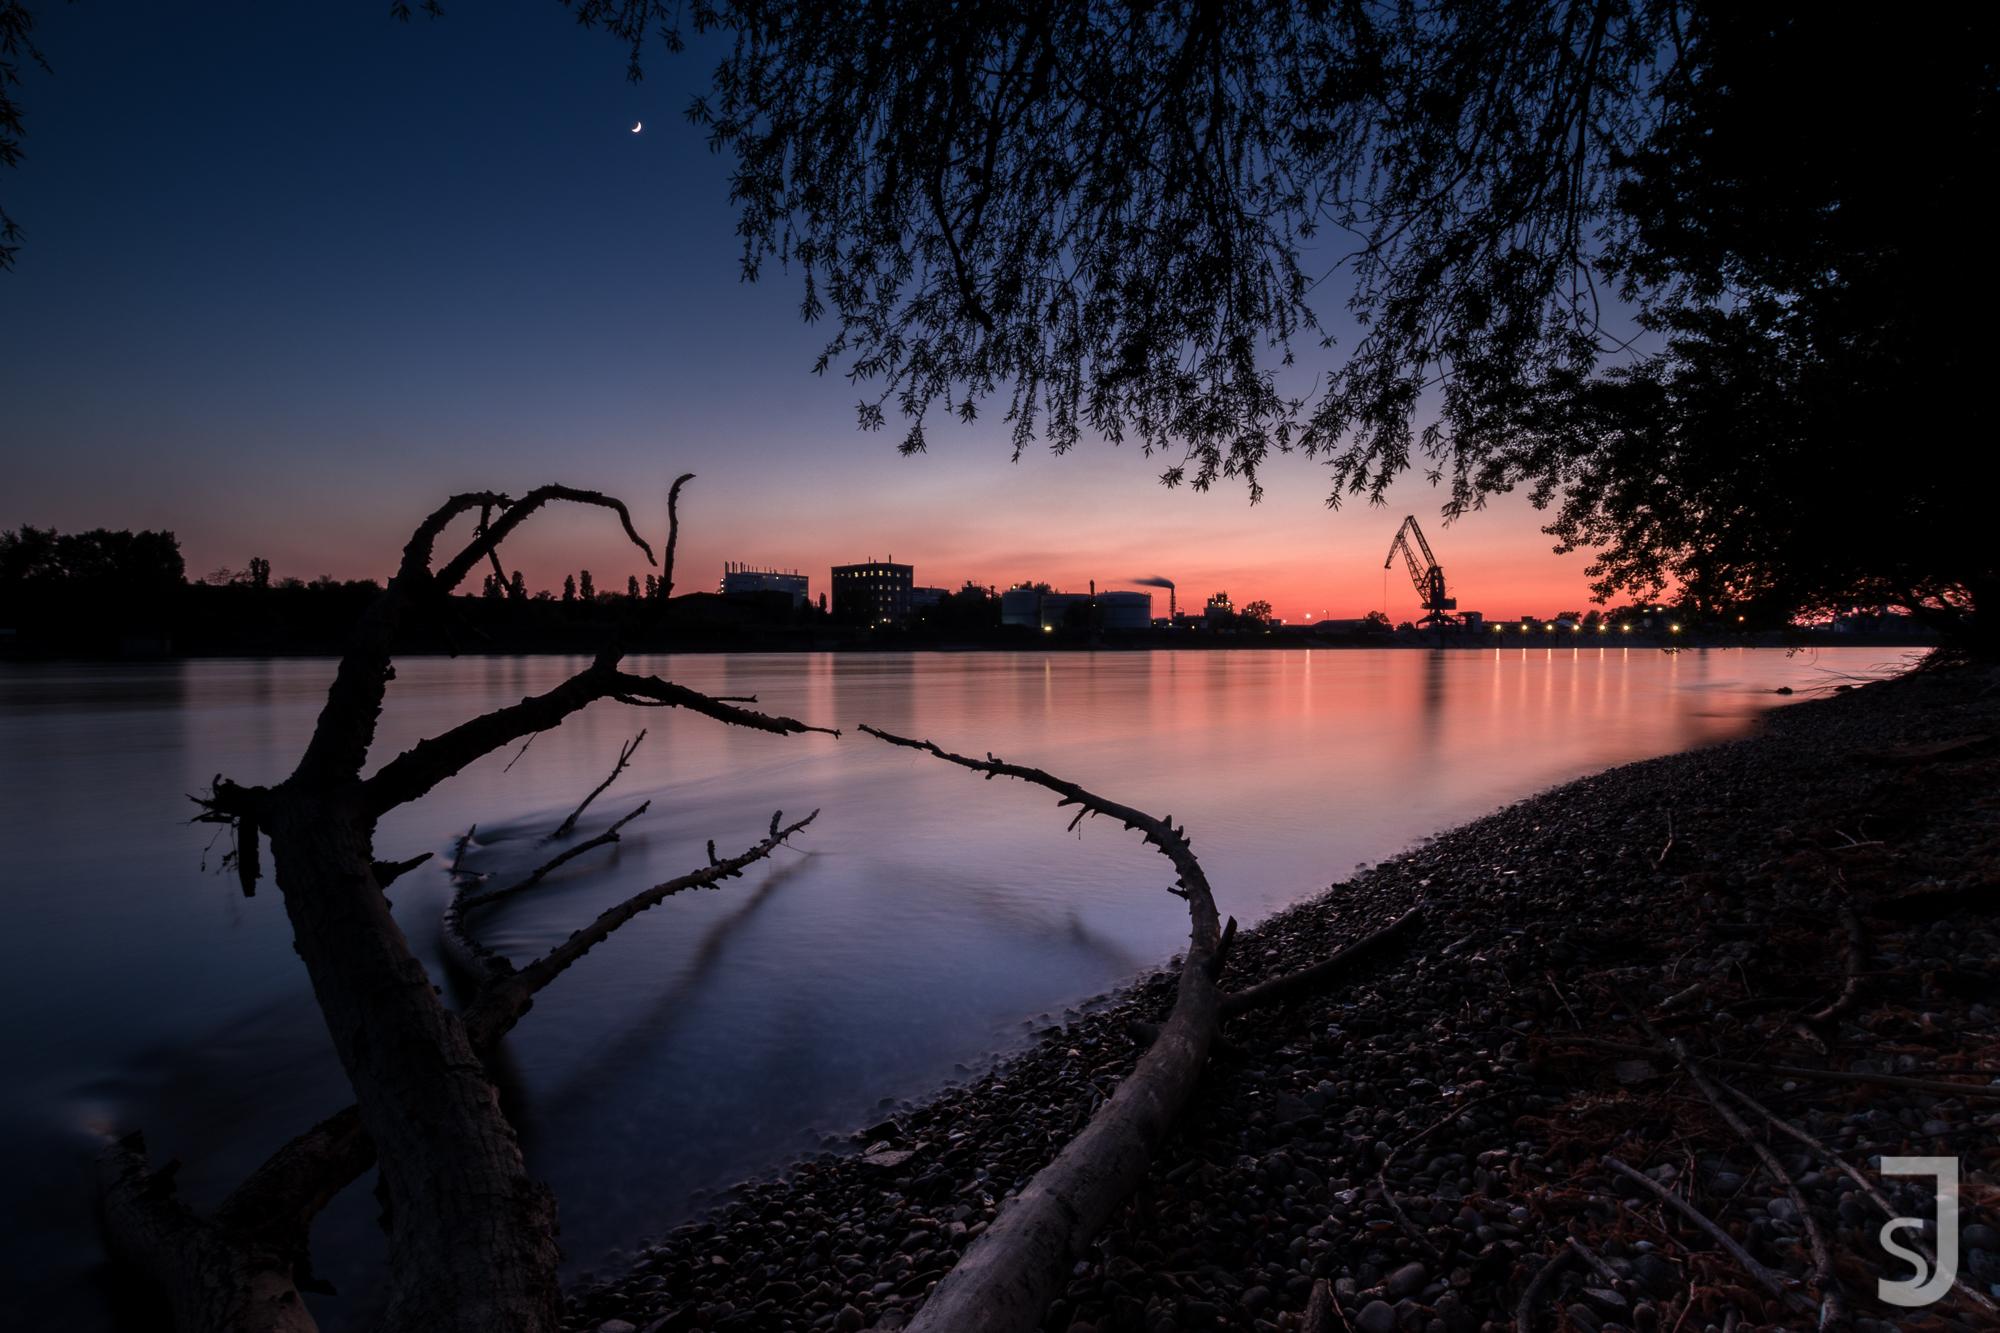 Sonnenuntergang_Rhein,_Mannheim_(rosa,_spät)